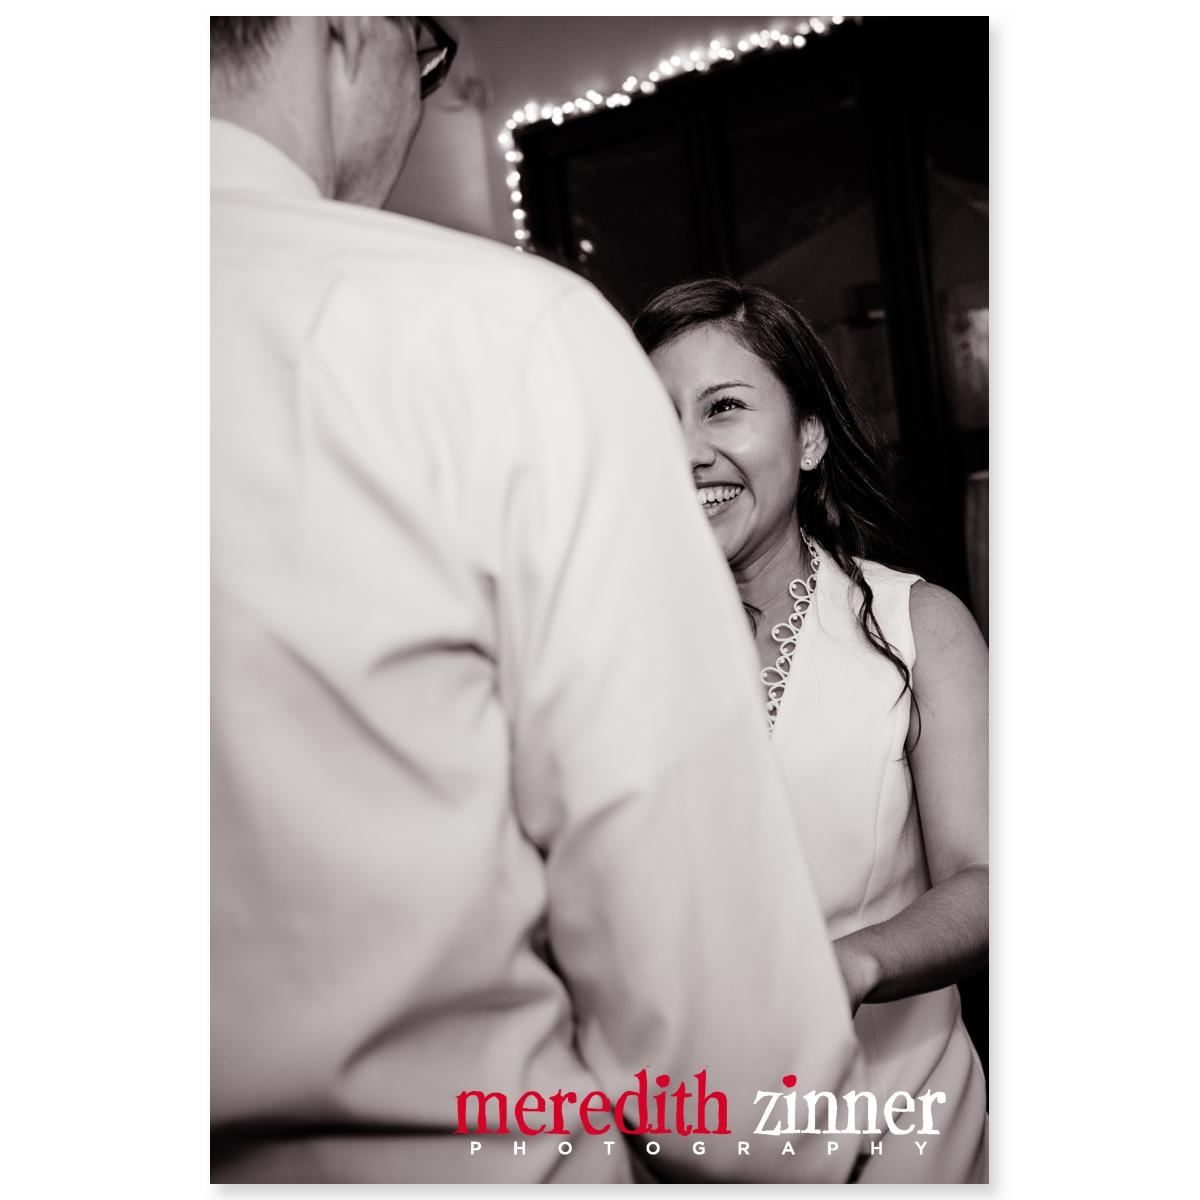 Meredith_Zinner_Photography_StilesCelebration_0405